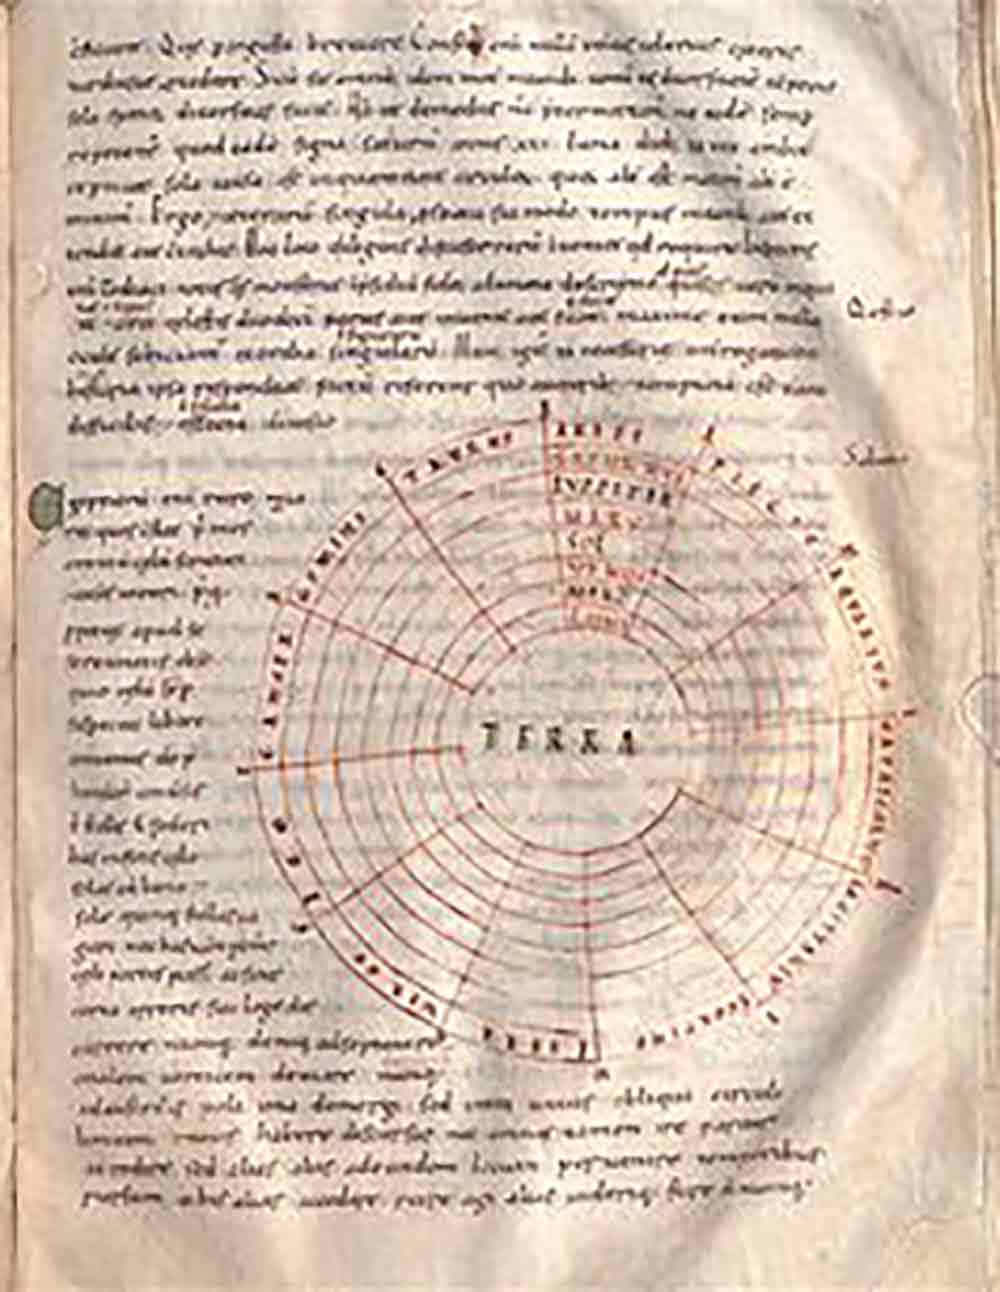 Astronomical-Treatises-circa-1000-25-I-WriterMariecor-I-WriterMariecor.com-2